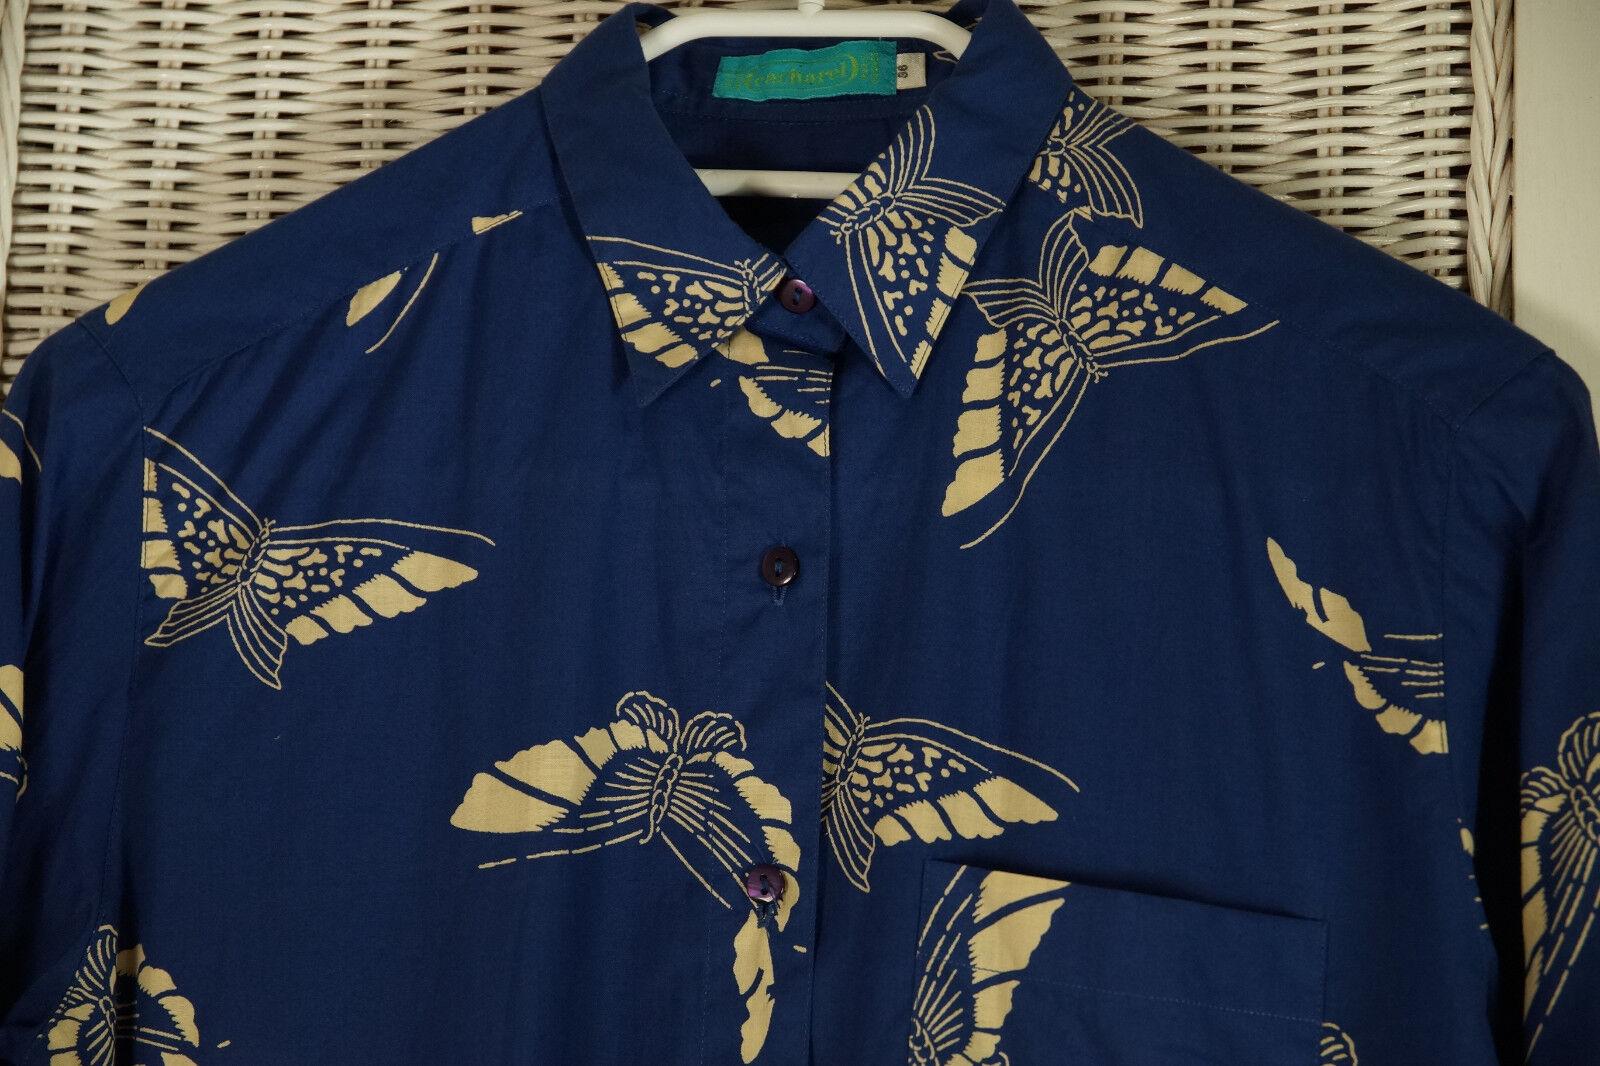 CACHAREL Butterfly Print Blouse 36 S Royal Blau Ecru Patterned Cotton Shirt Top